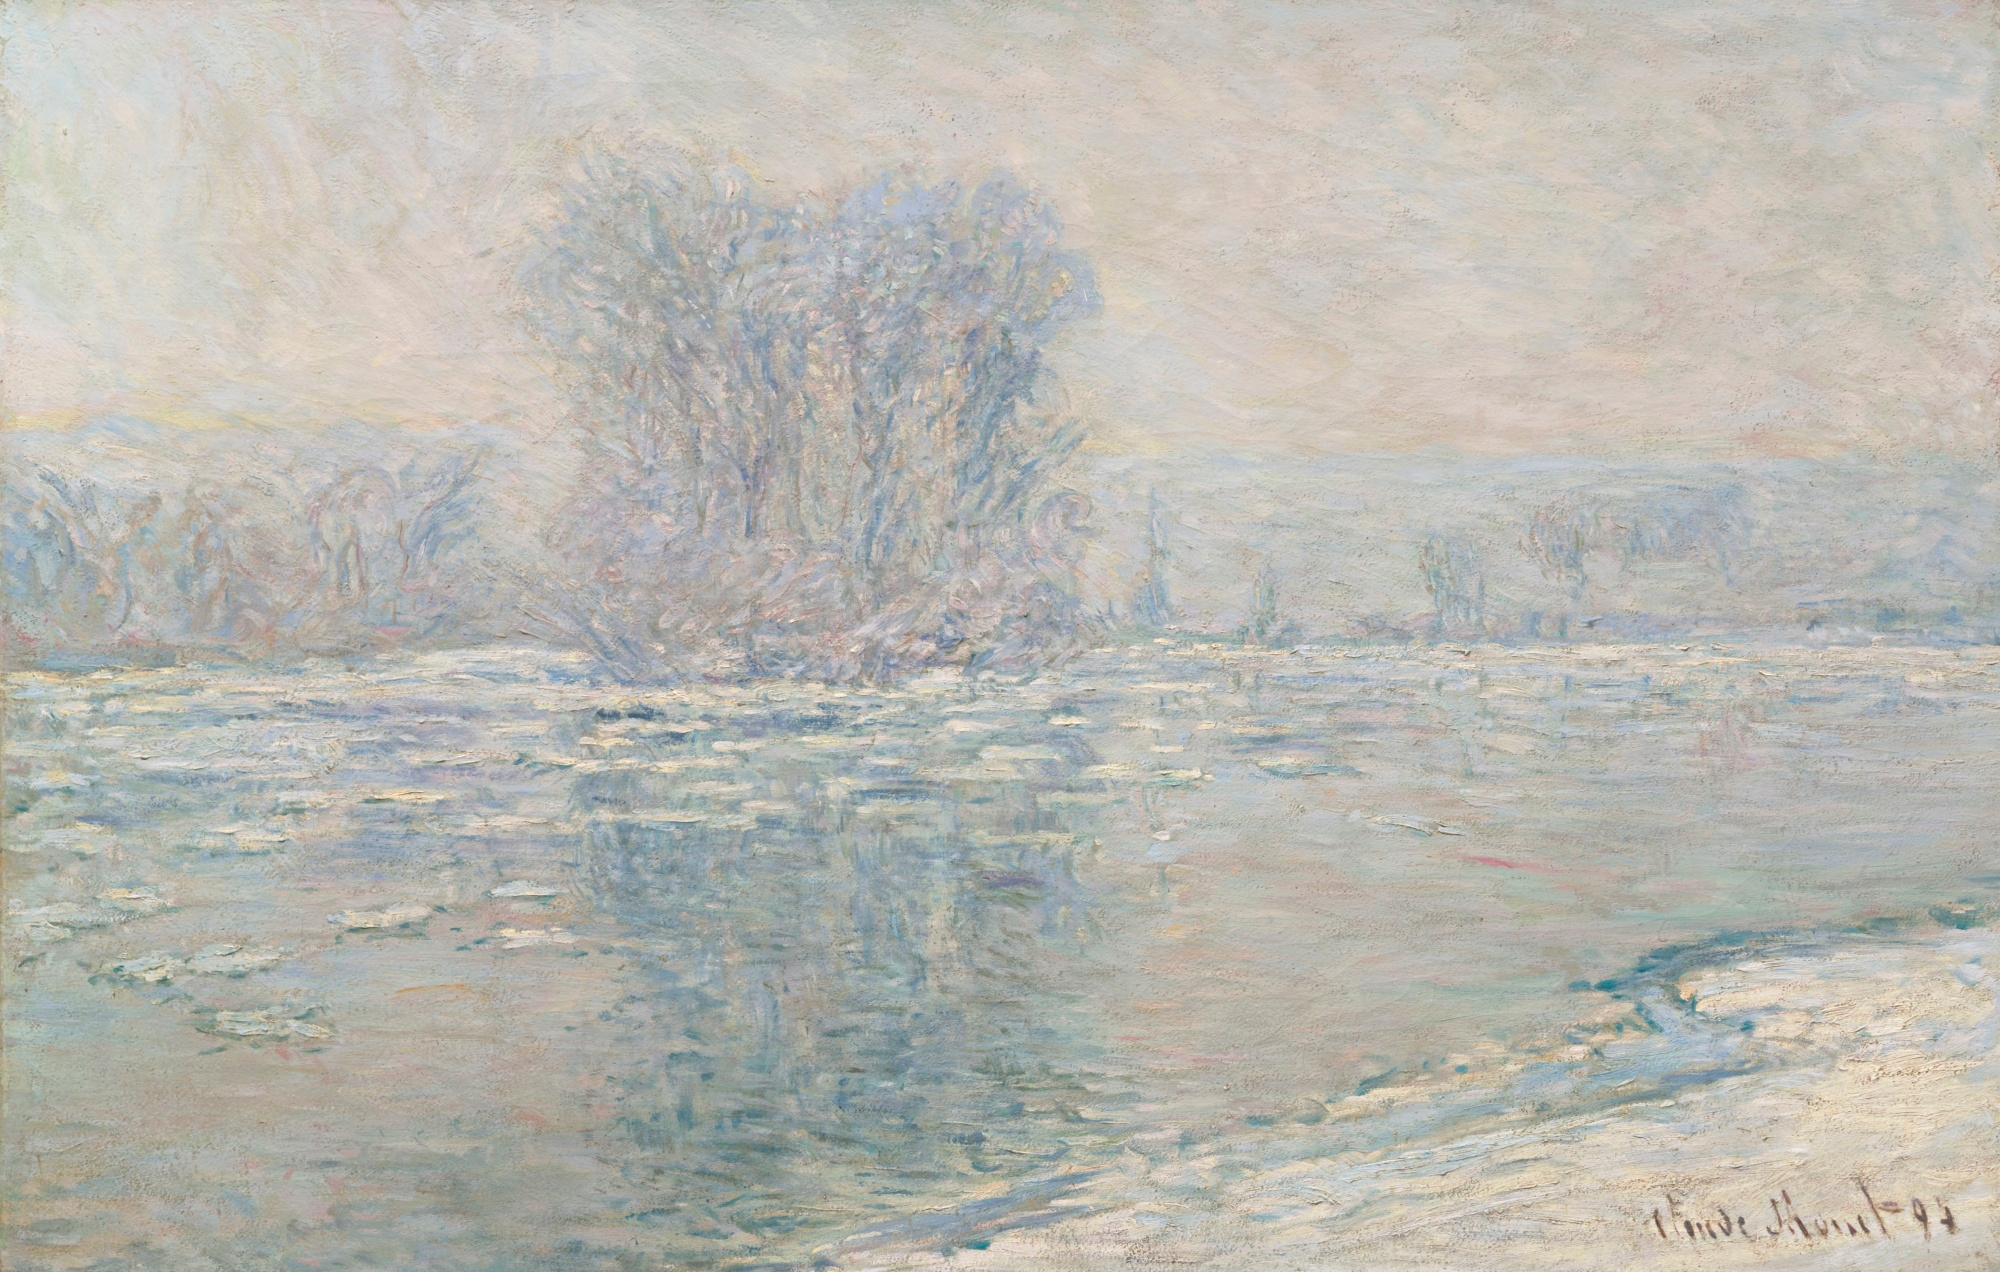 childe hassam house watercolor paintings - Google Search | Artist monet, Claude  monet, Monet paintings